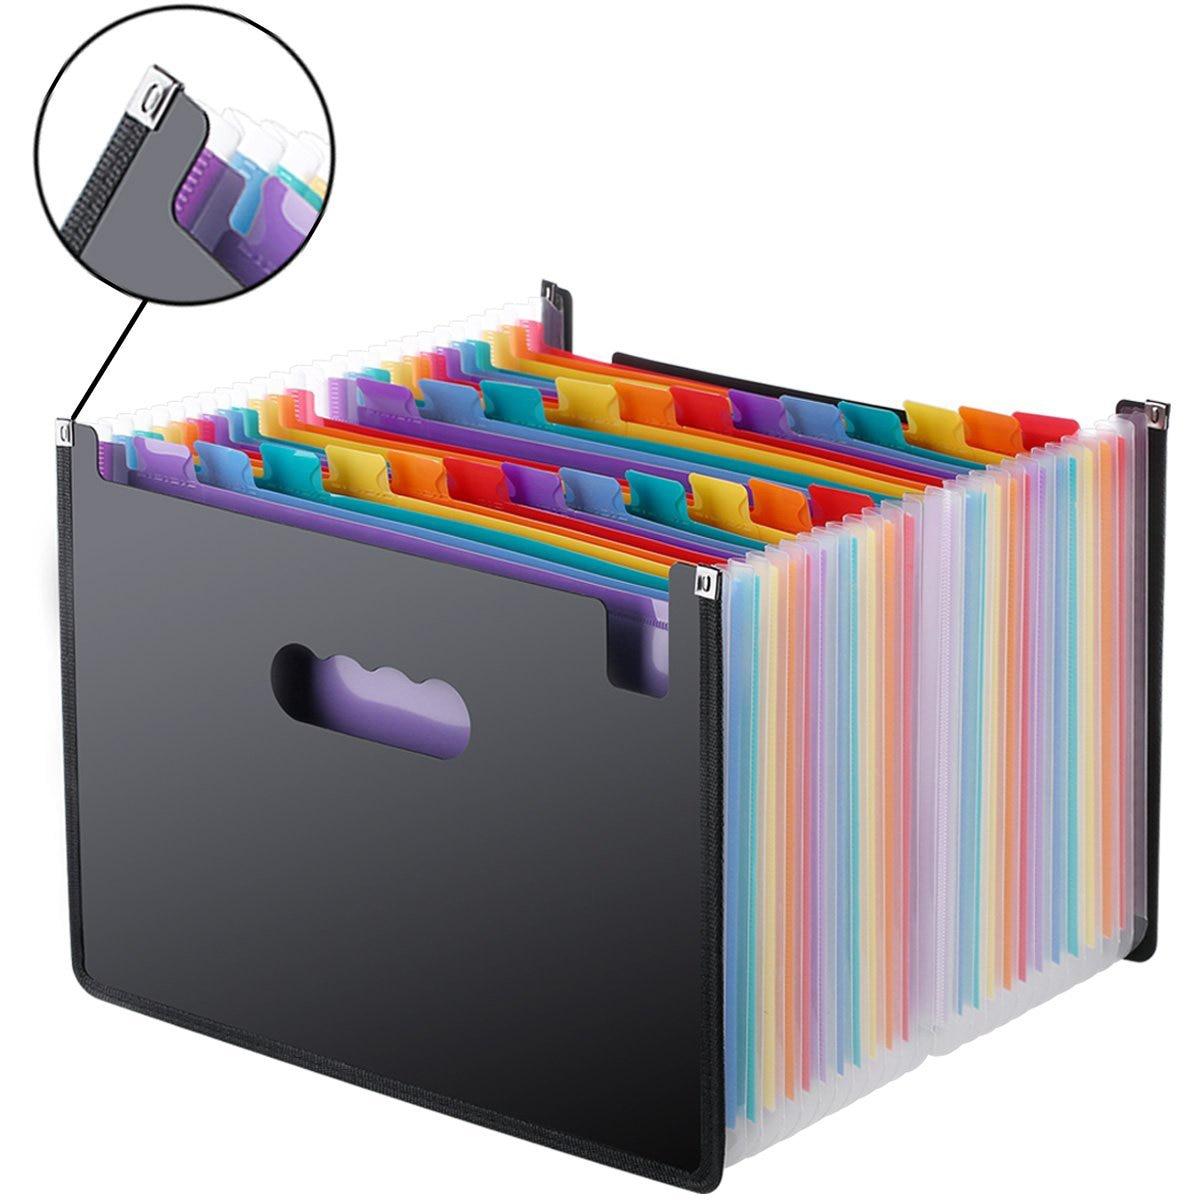 Expanding File A4 Folder Office School Portfolio File Folders Document Organizer Plastic 24 Pockets 3000 Sheets Large Capacity